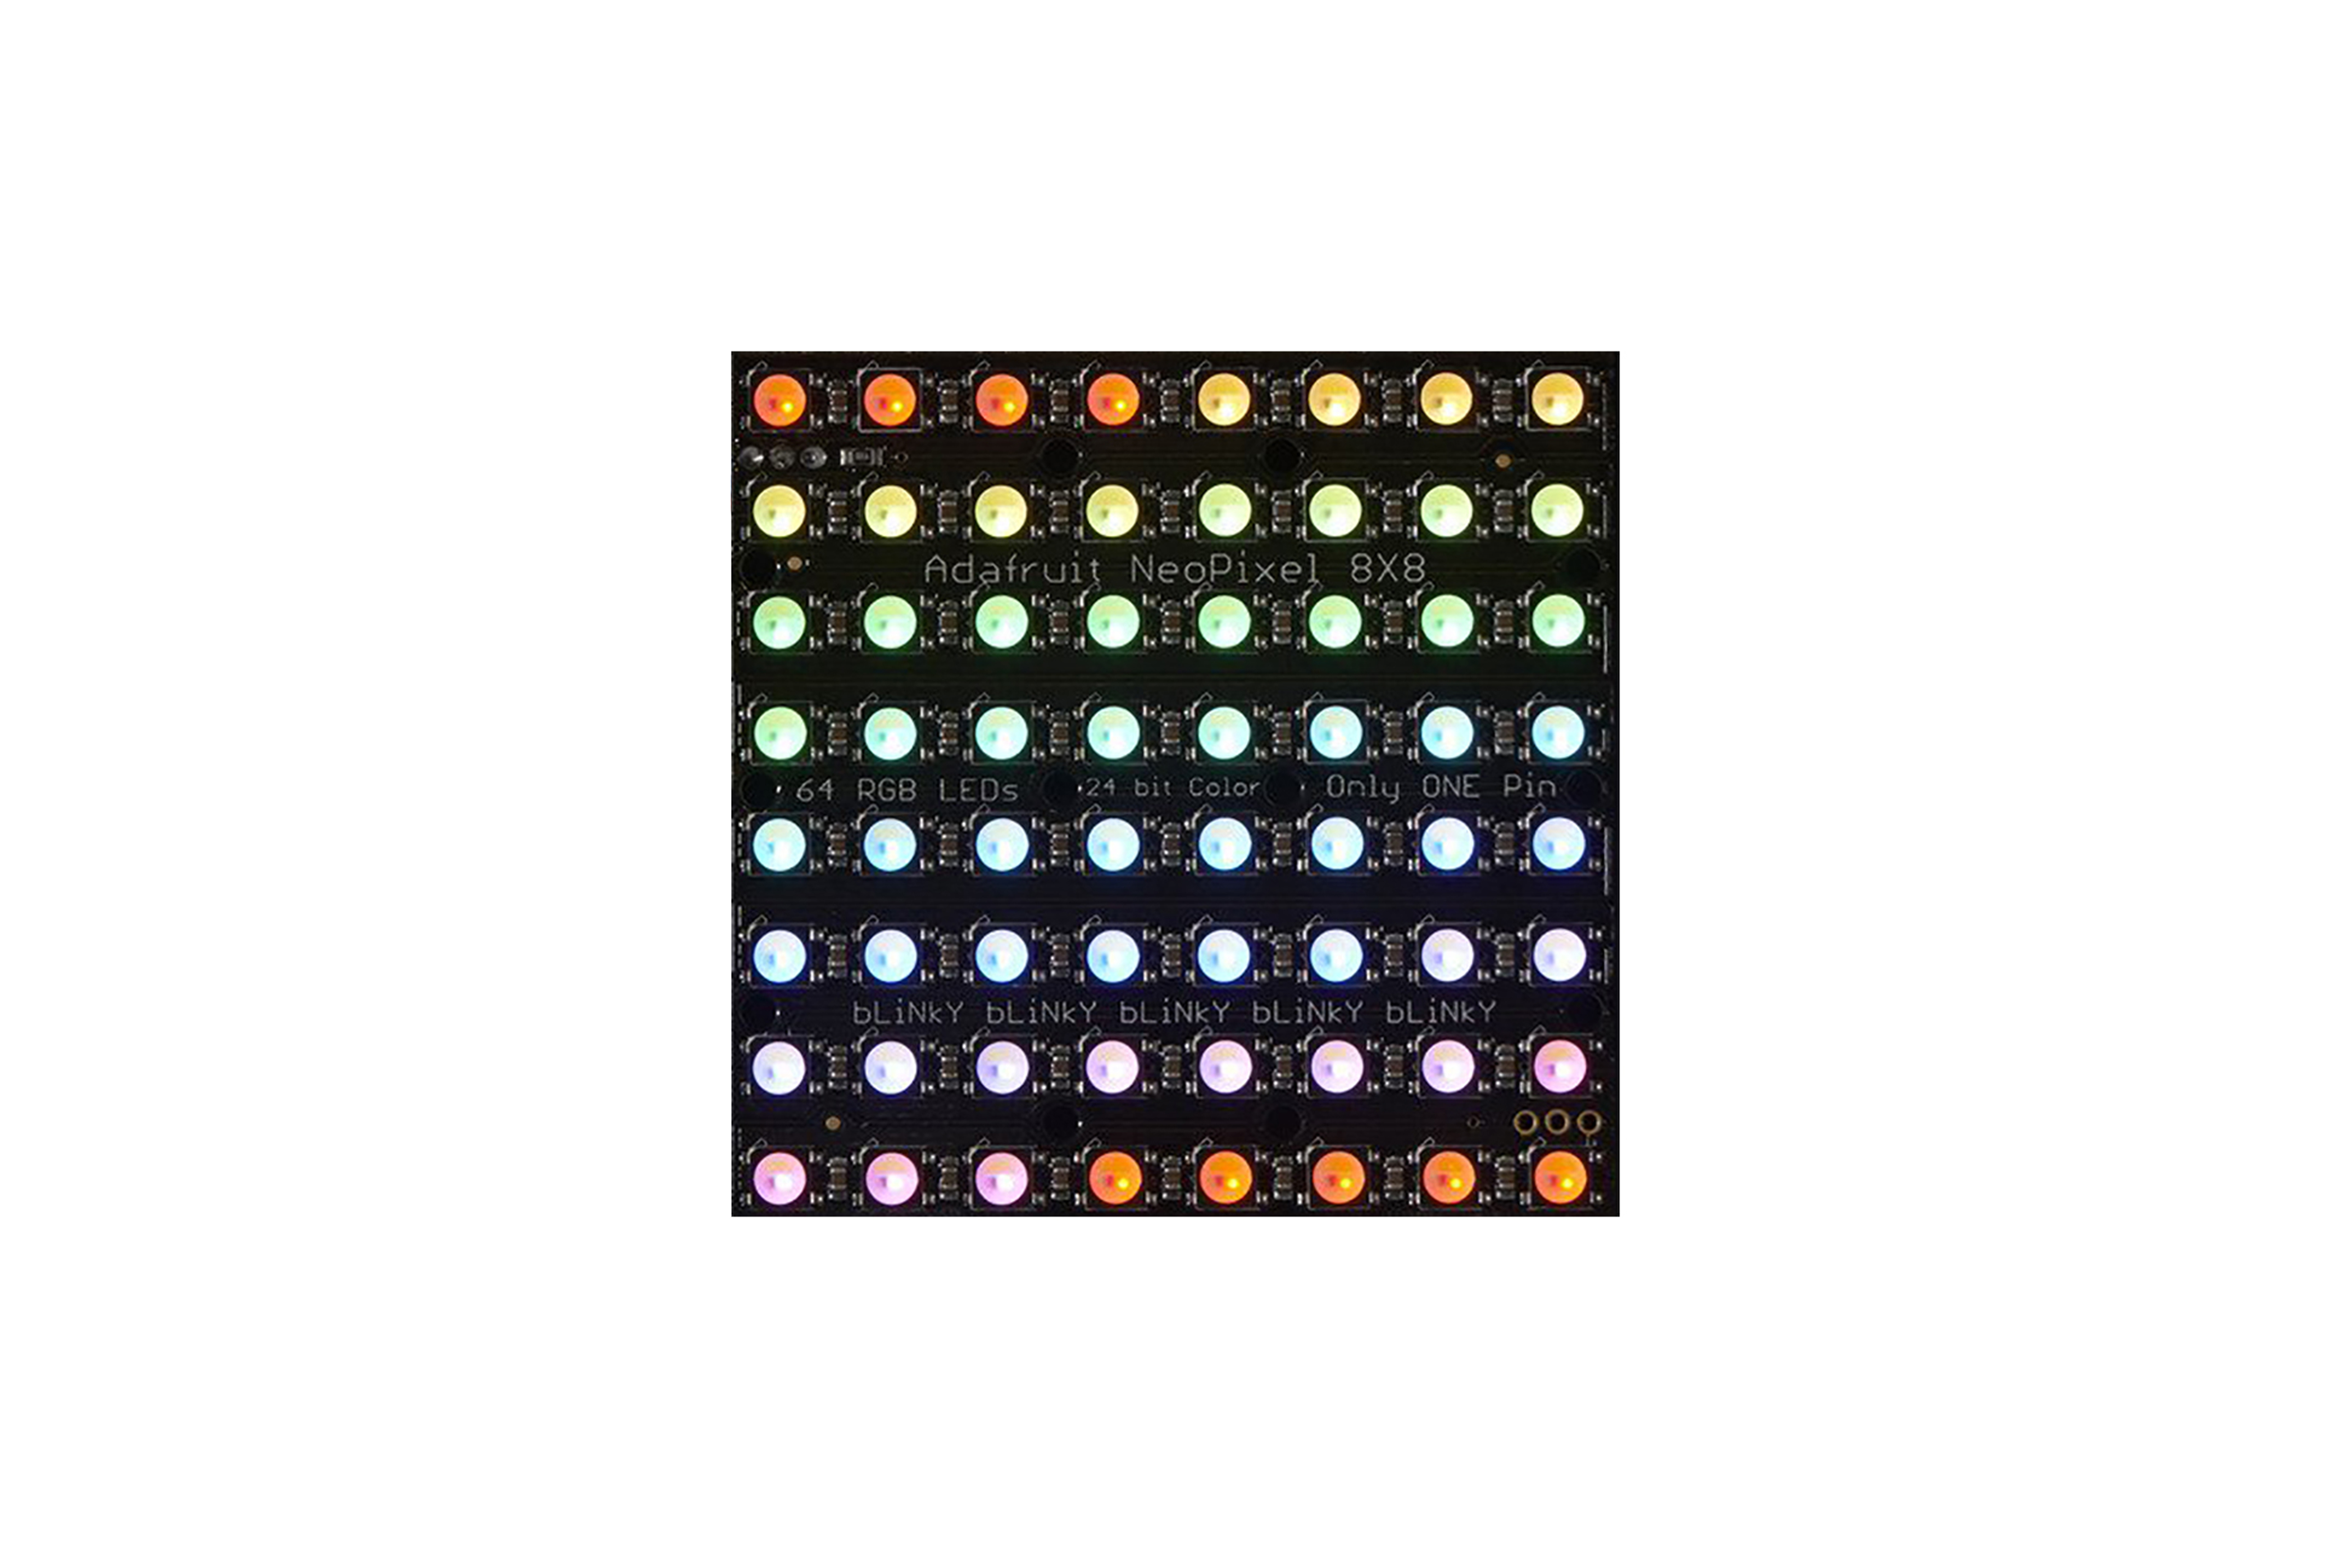 NEOPIXEL NEOMATRIX 64 RGBW LED 3000K